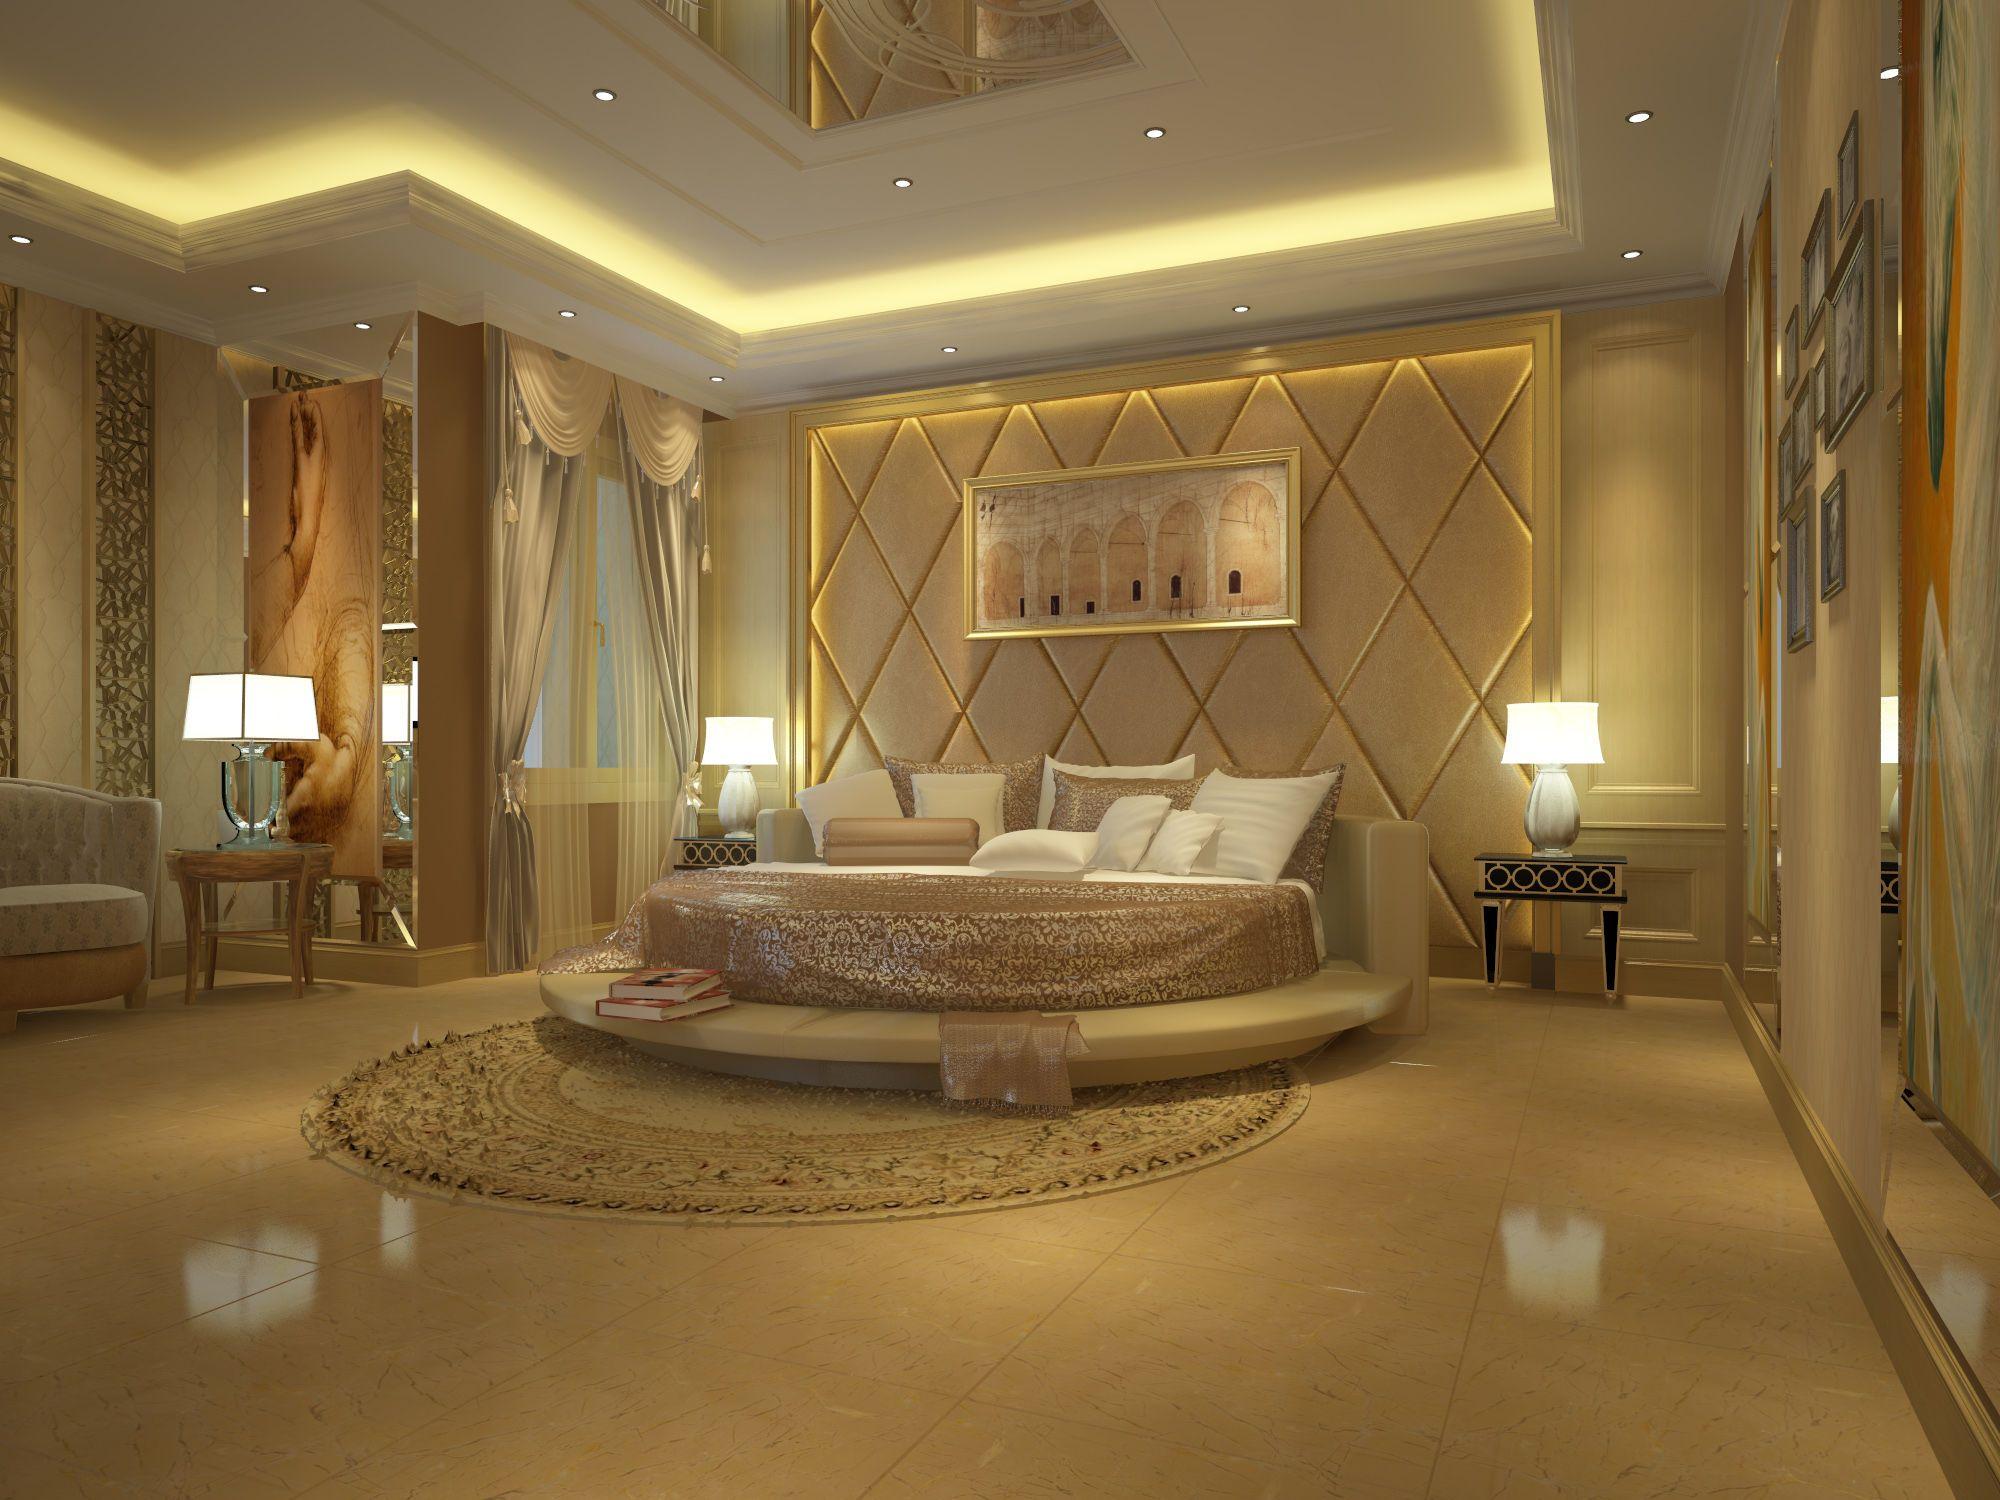 30 Romantic Master Bedroom Designs Luxury Master Bedroom Design Elegant Bedroom Luxurious Bedrooms